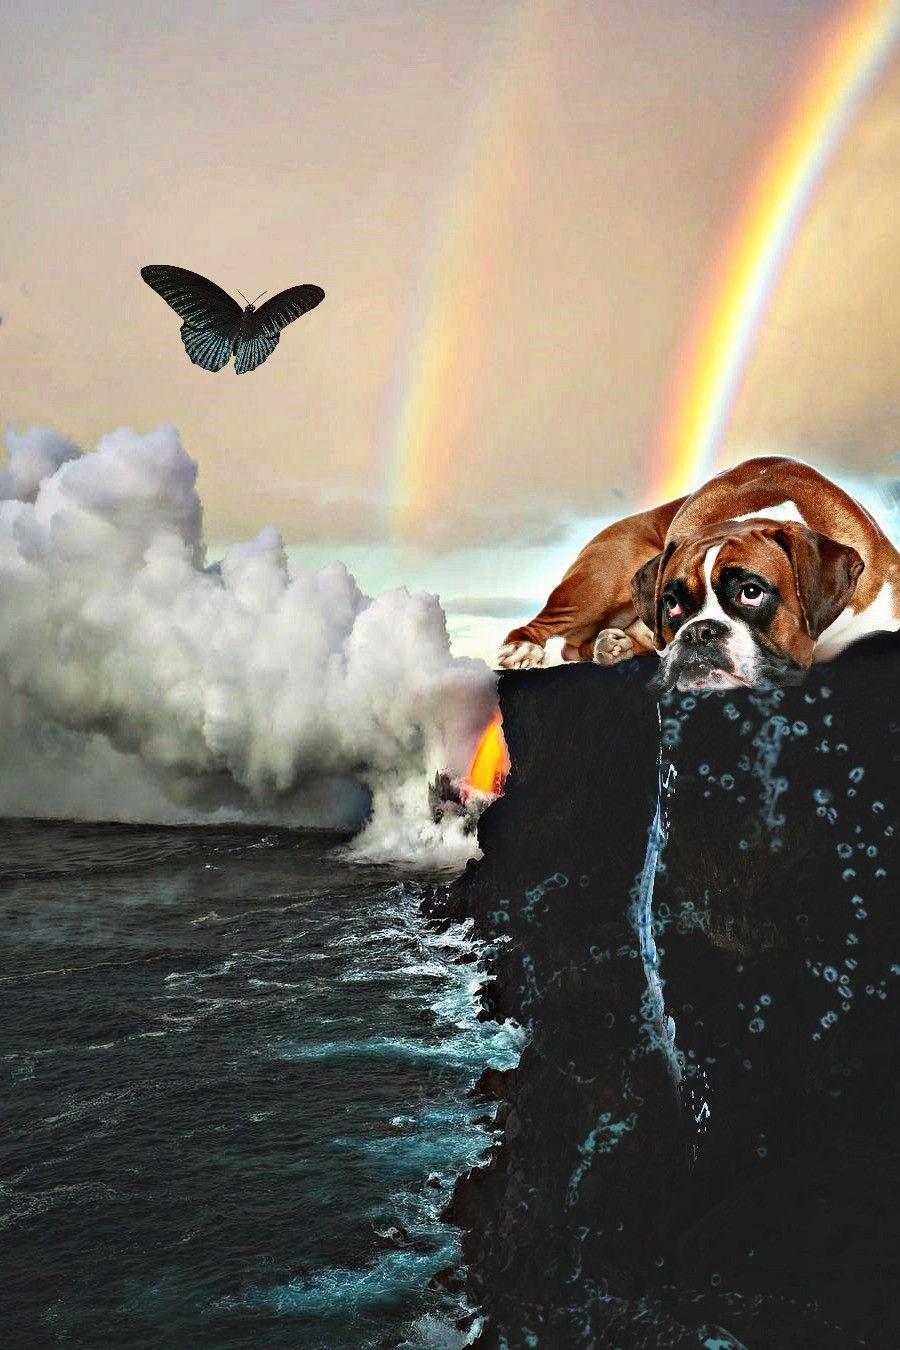 #daydream #imagination #dogs#butterfly #landscape#mixedmediaart